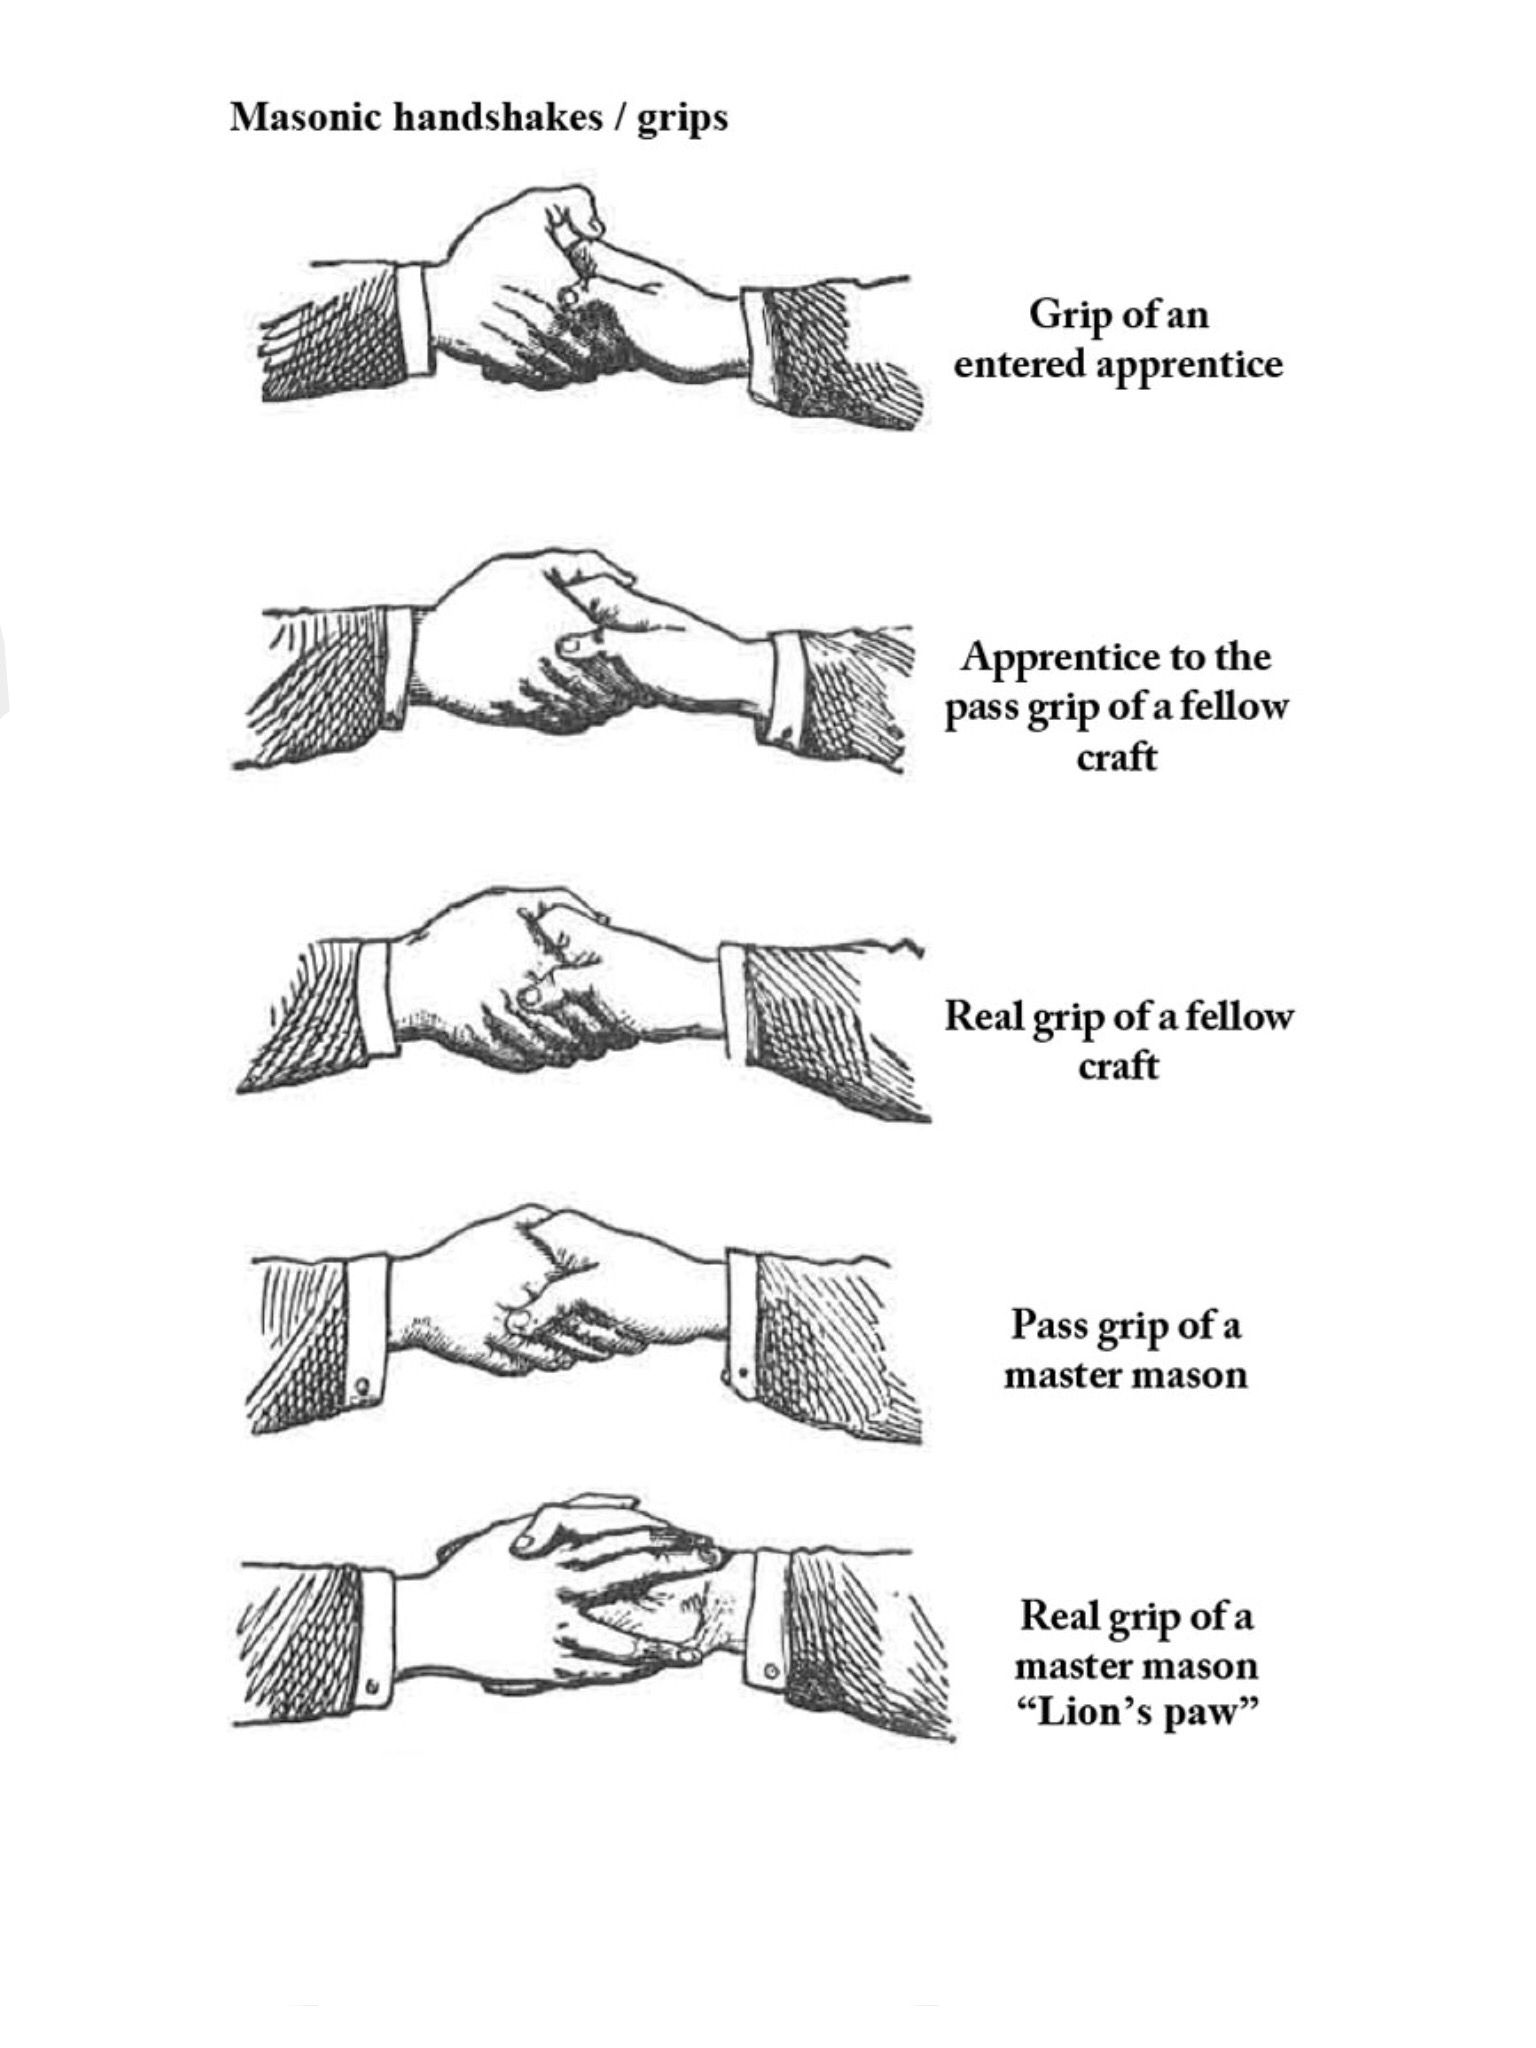 Masonic handshakes mormon plagerized temple rituals truth 2 luciferian sadistic pedophilian masonic illuminati top elite rule the world buycottarizona Images